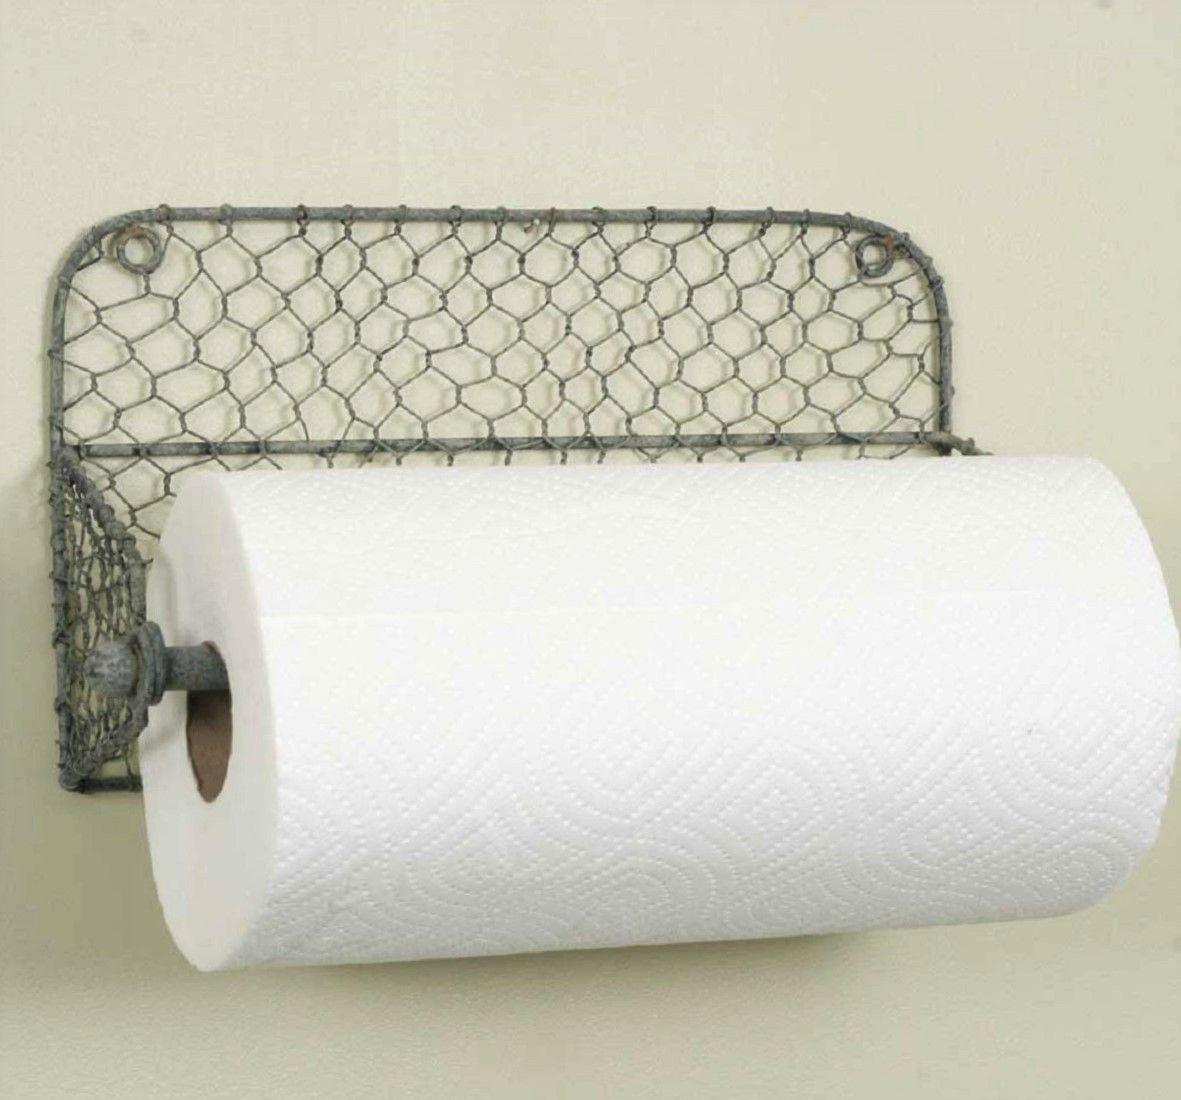 Rustic Farmhouse Wall Mount Paper Towel Holder Paper Towel Holder Towel Holder Farmhouse Kitchen Decor